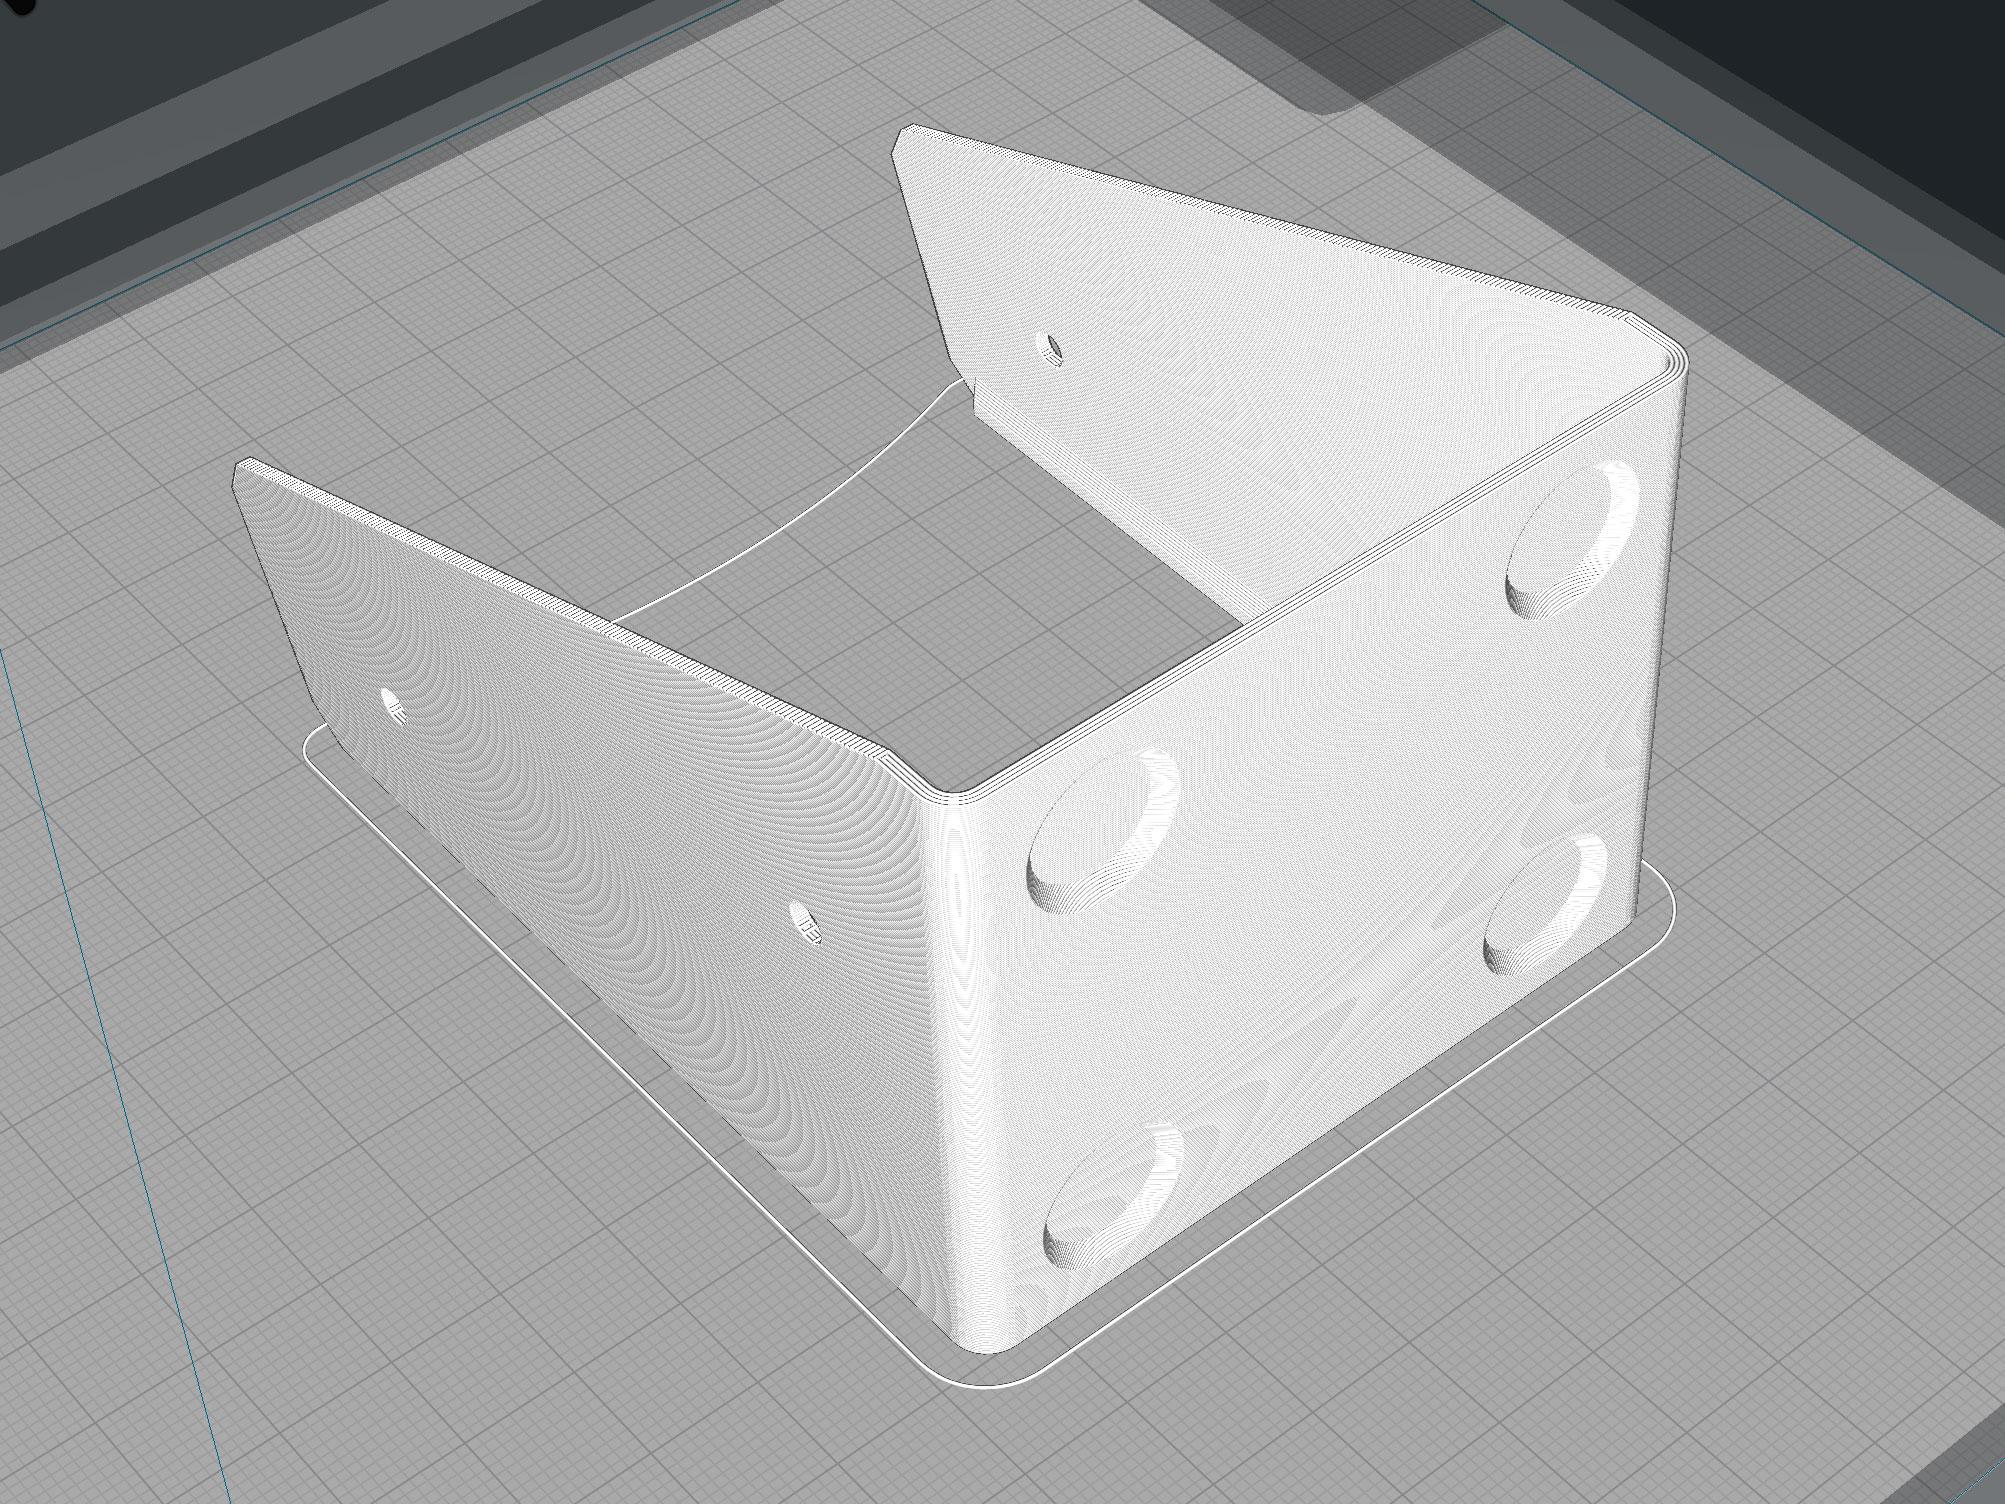 3d_printing_cura-slice.jpg